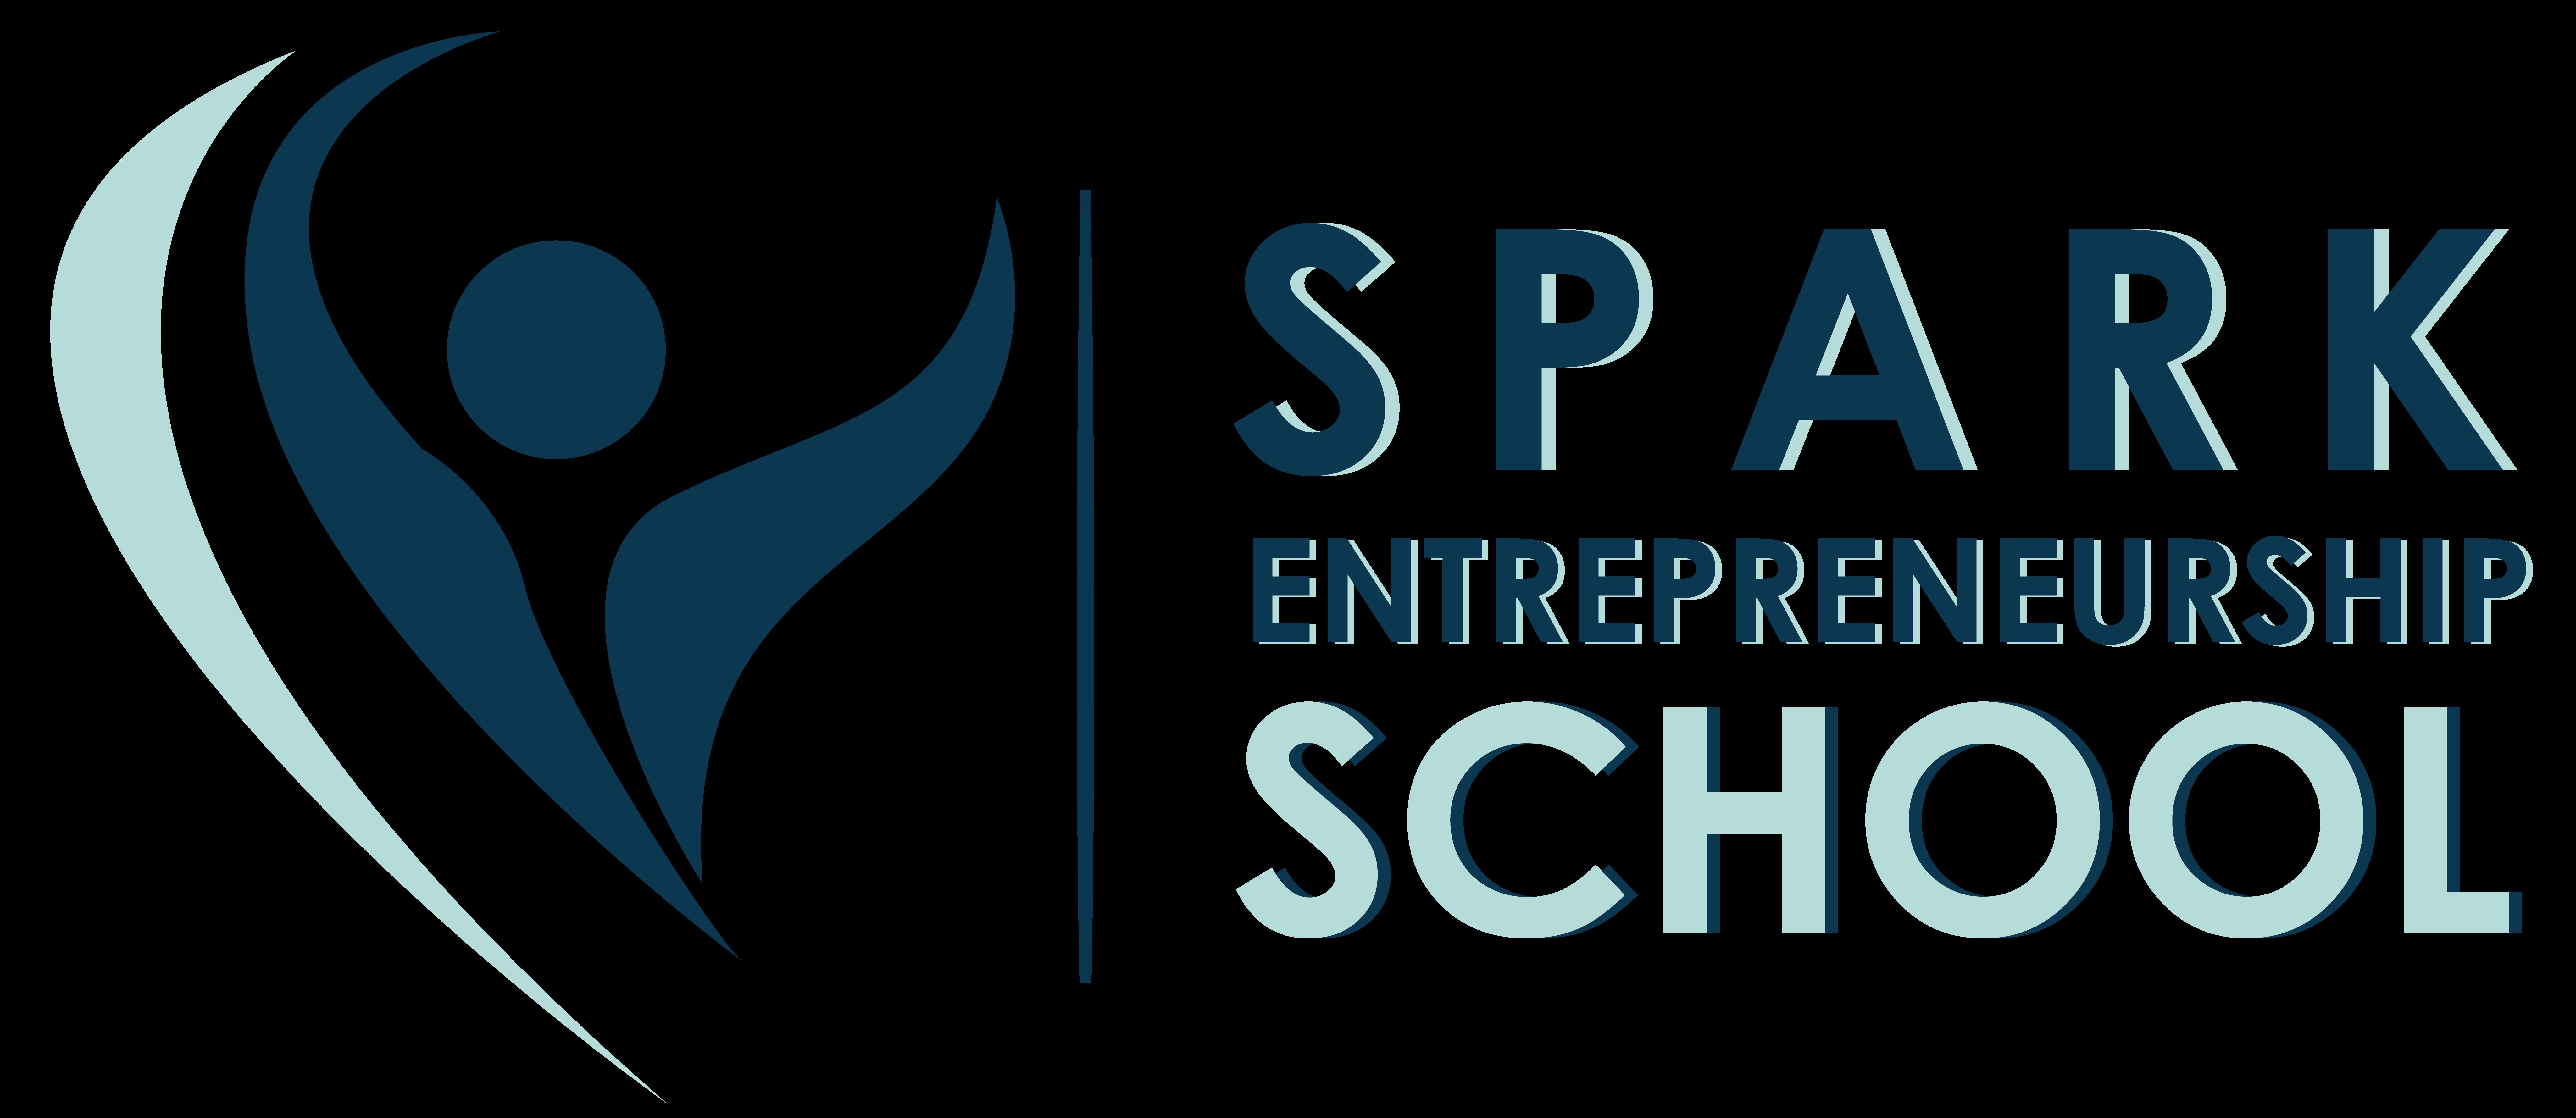 SPARK Jordan Entrepreneurship School